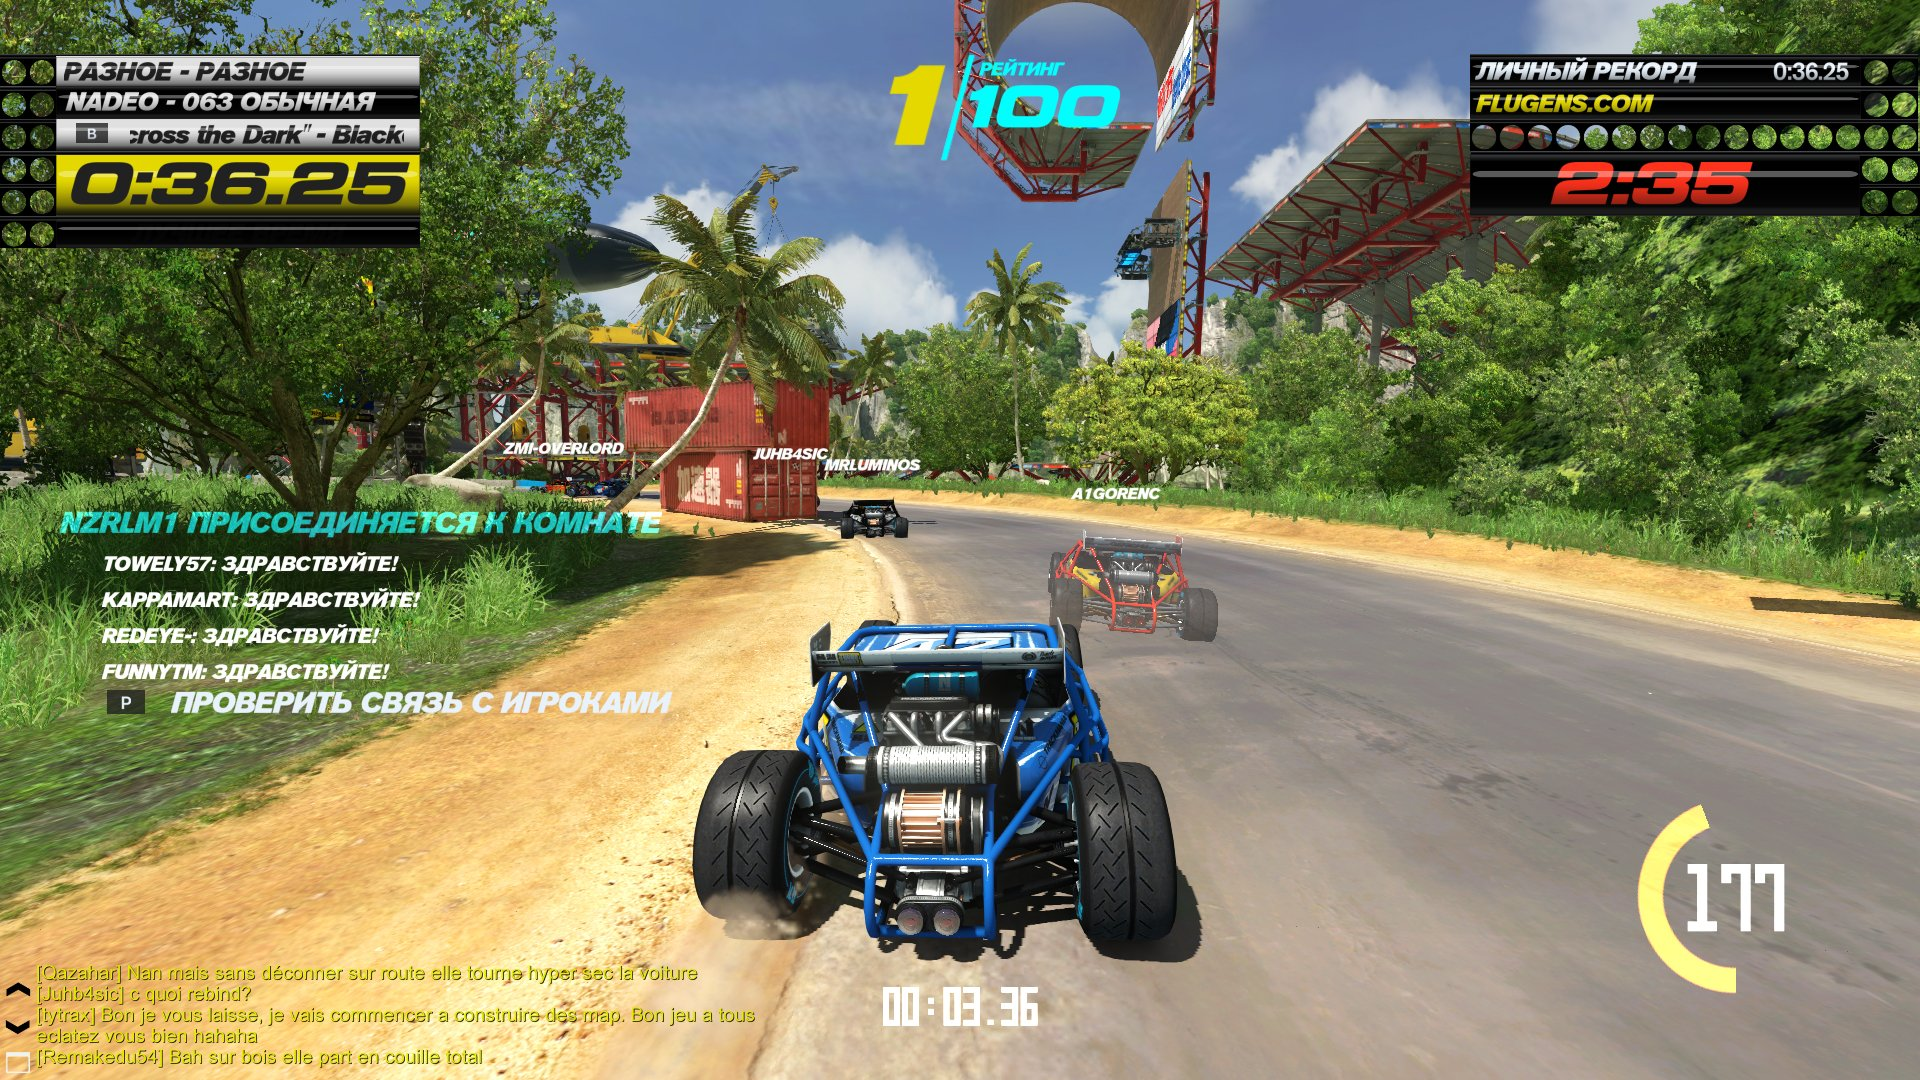 Обзор TrackMania Turbo. - Изображение 2